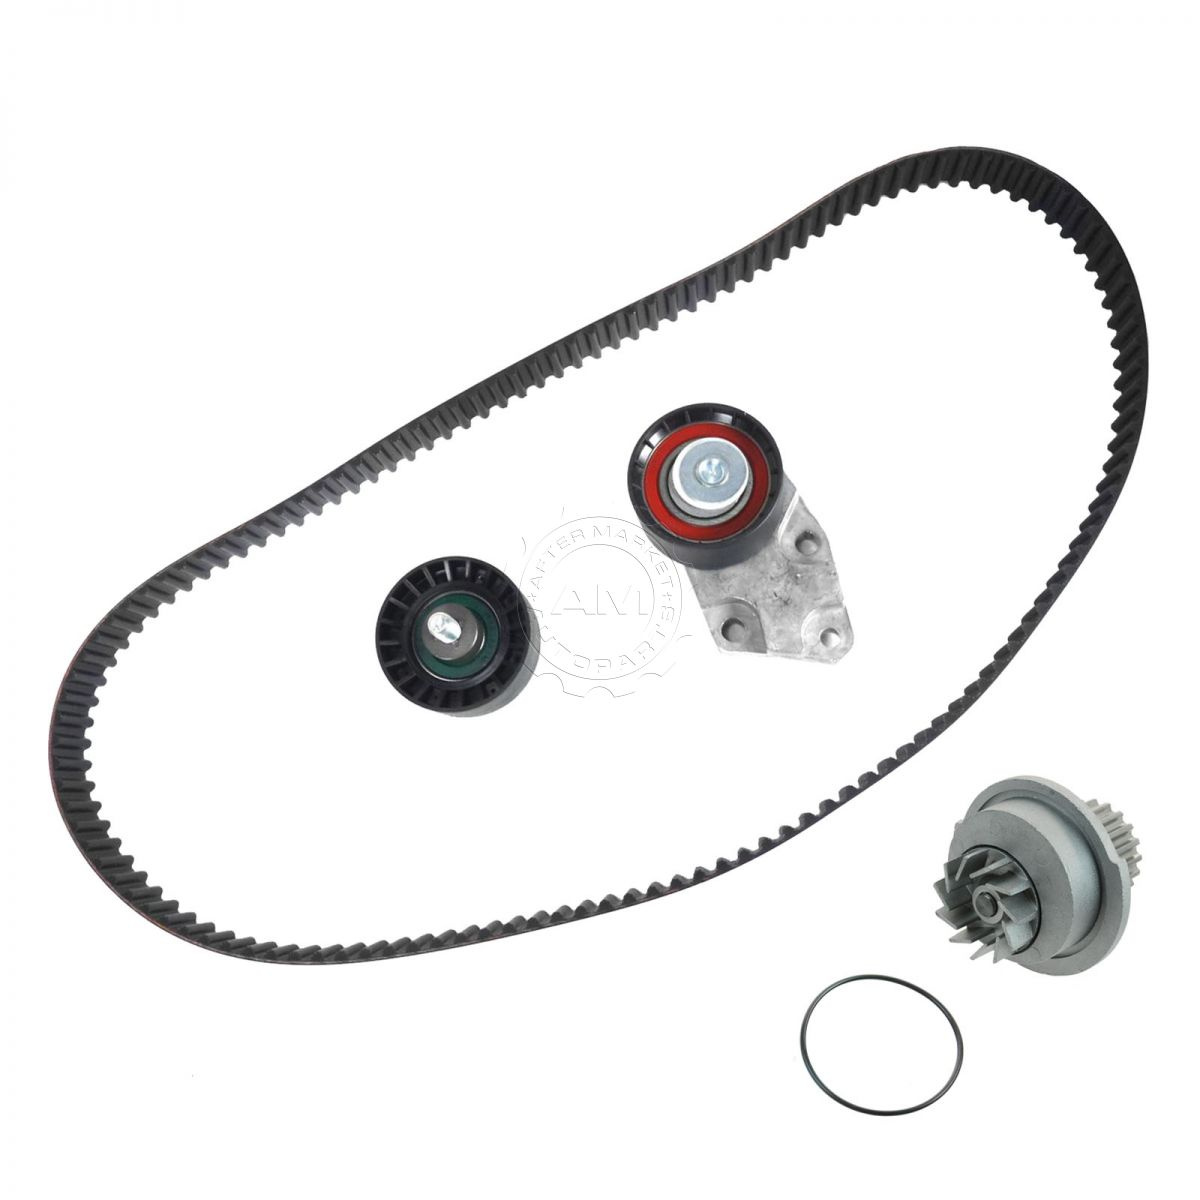 timing belt  u0026 water pump set kit for chevy aveo aveo5 pontiac wave suzuki swift 192659202659